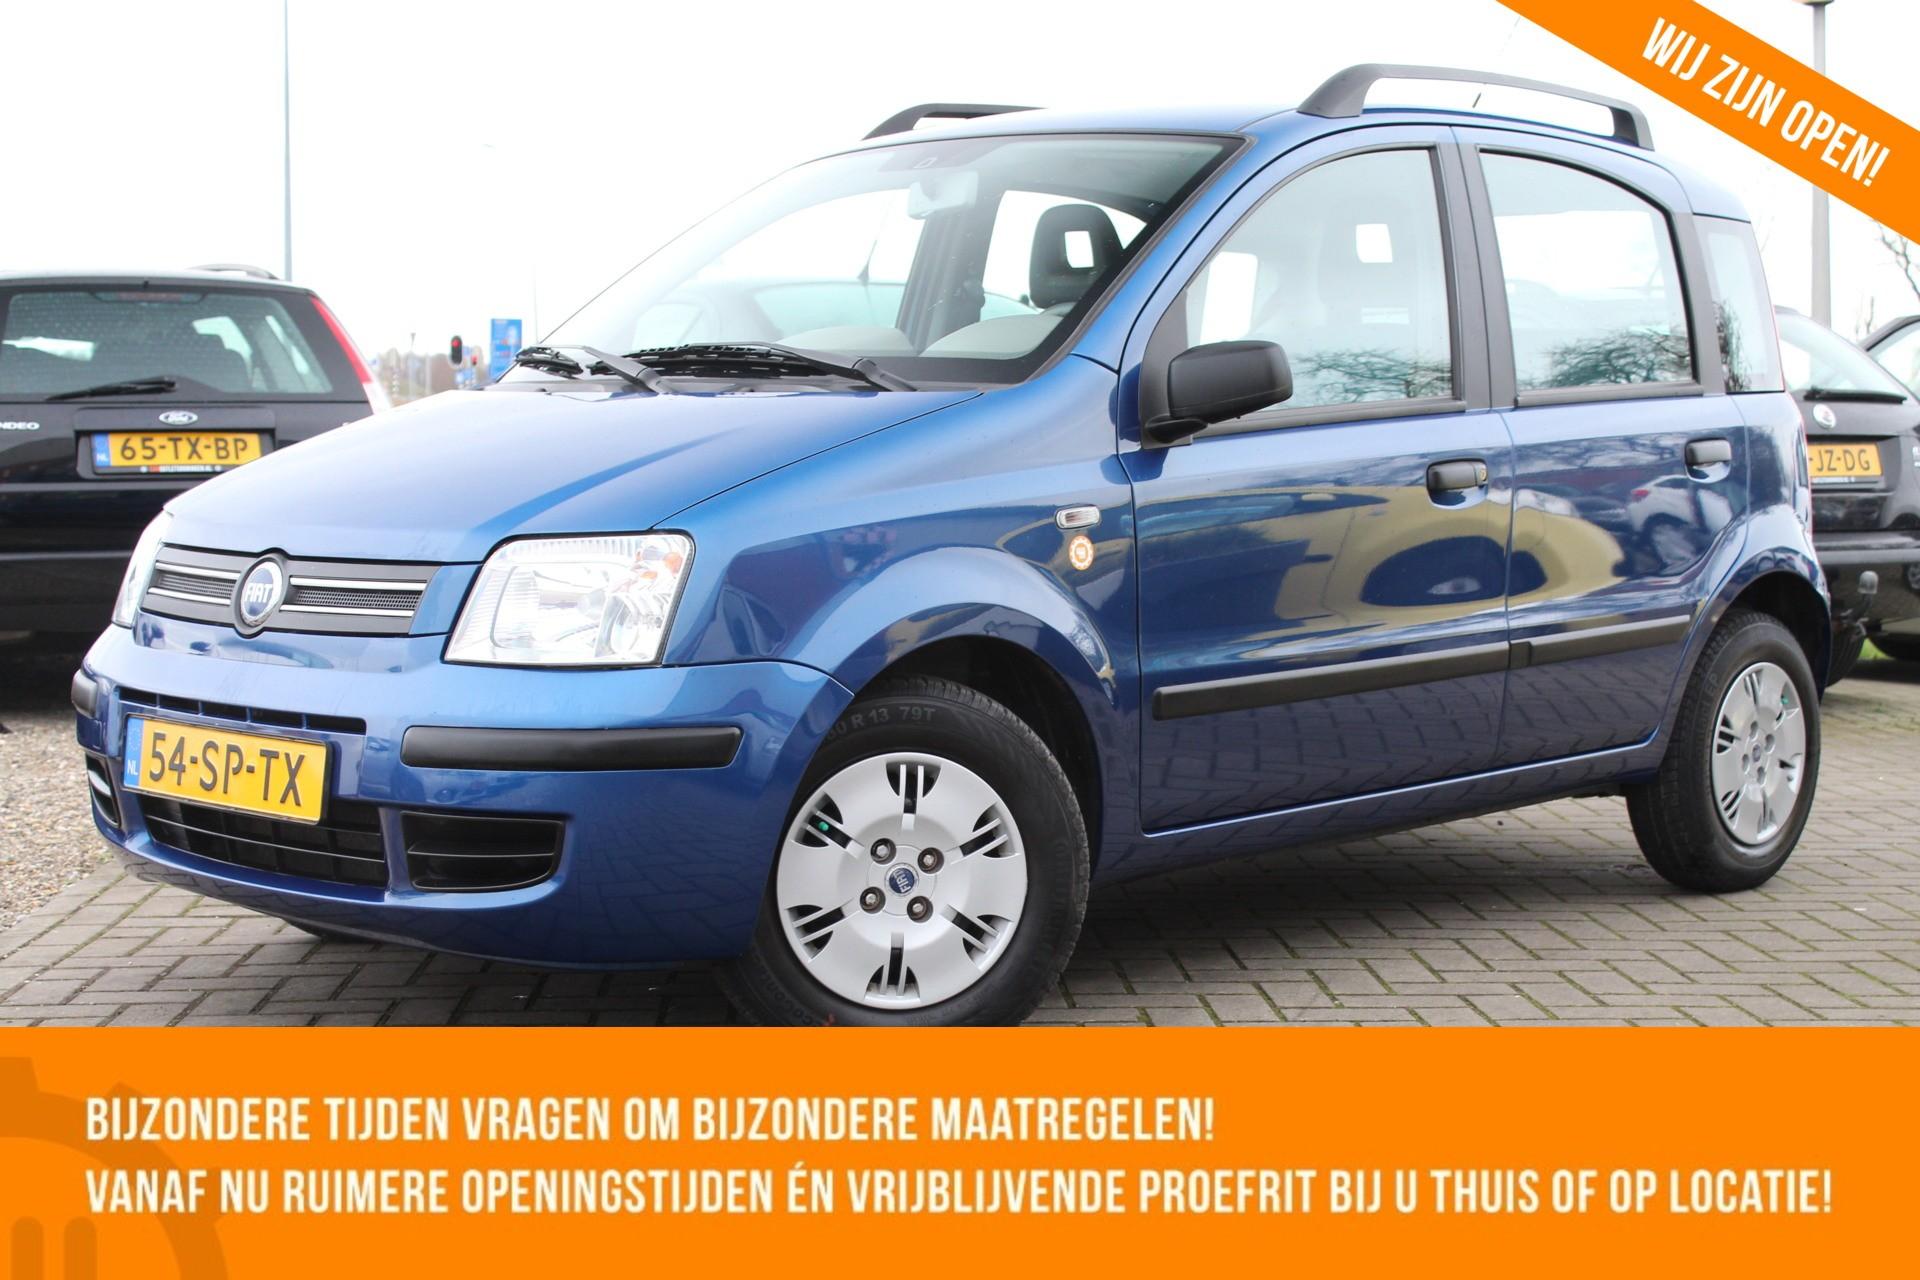 Caroutlet Groningen - Fiat Panda 1.2 Navigator AUTOMAAT | LAGE KM STAND | ELEK PAKKET |